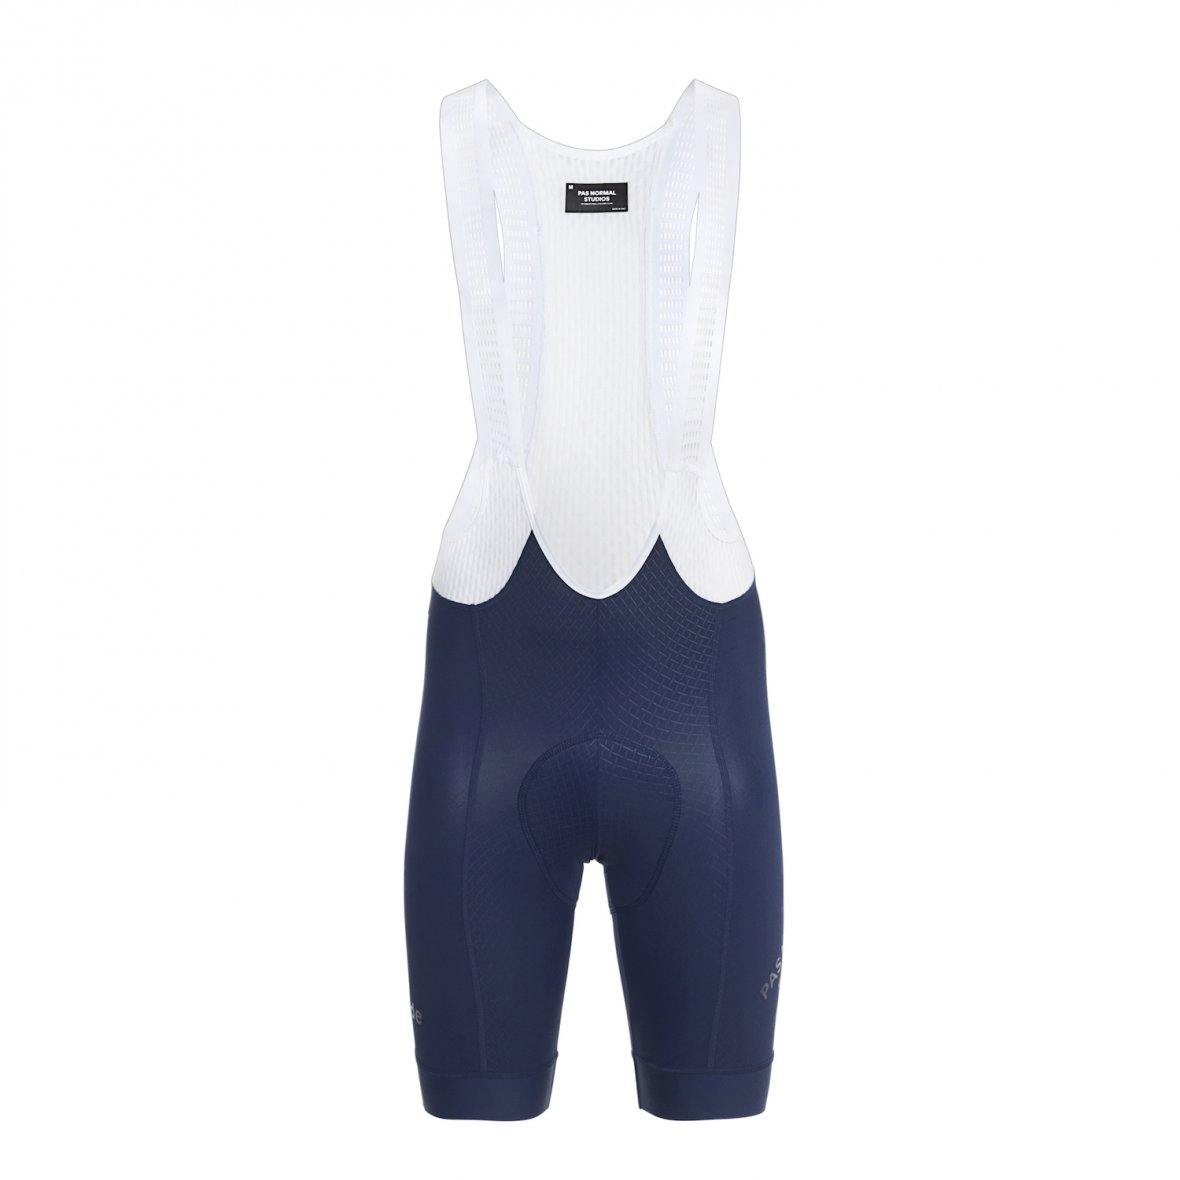 Culotte de ciclismo profesional para hombre, pantalones cortos de equipo azul marino,...